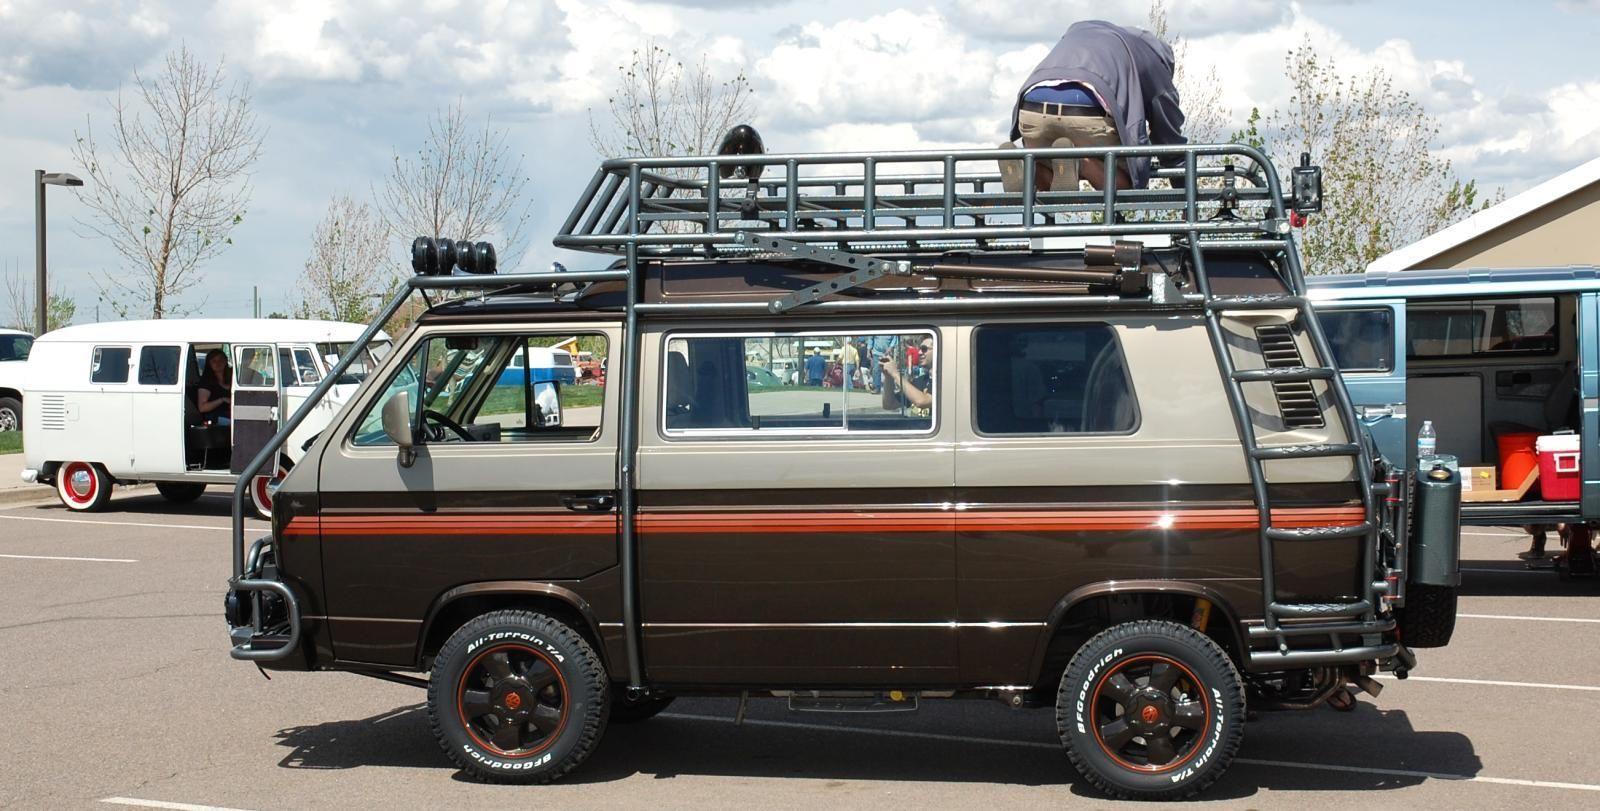 Oscar The Incredibly Customized Vanagon In 2020 Vw Bus Camper Volkswagen Transporter Volkswagen